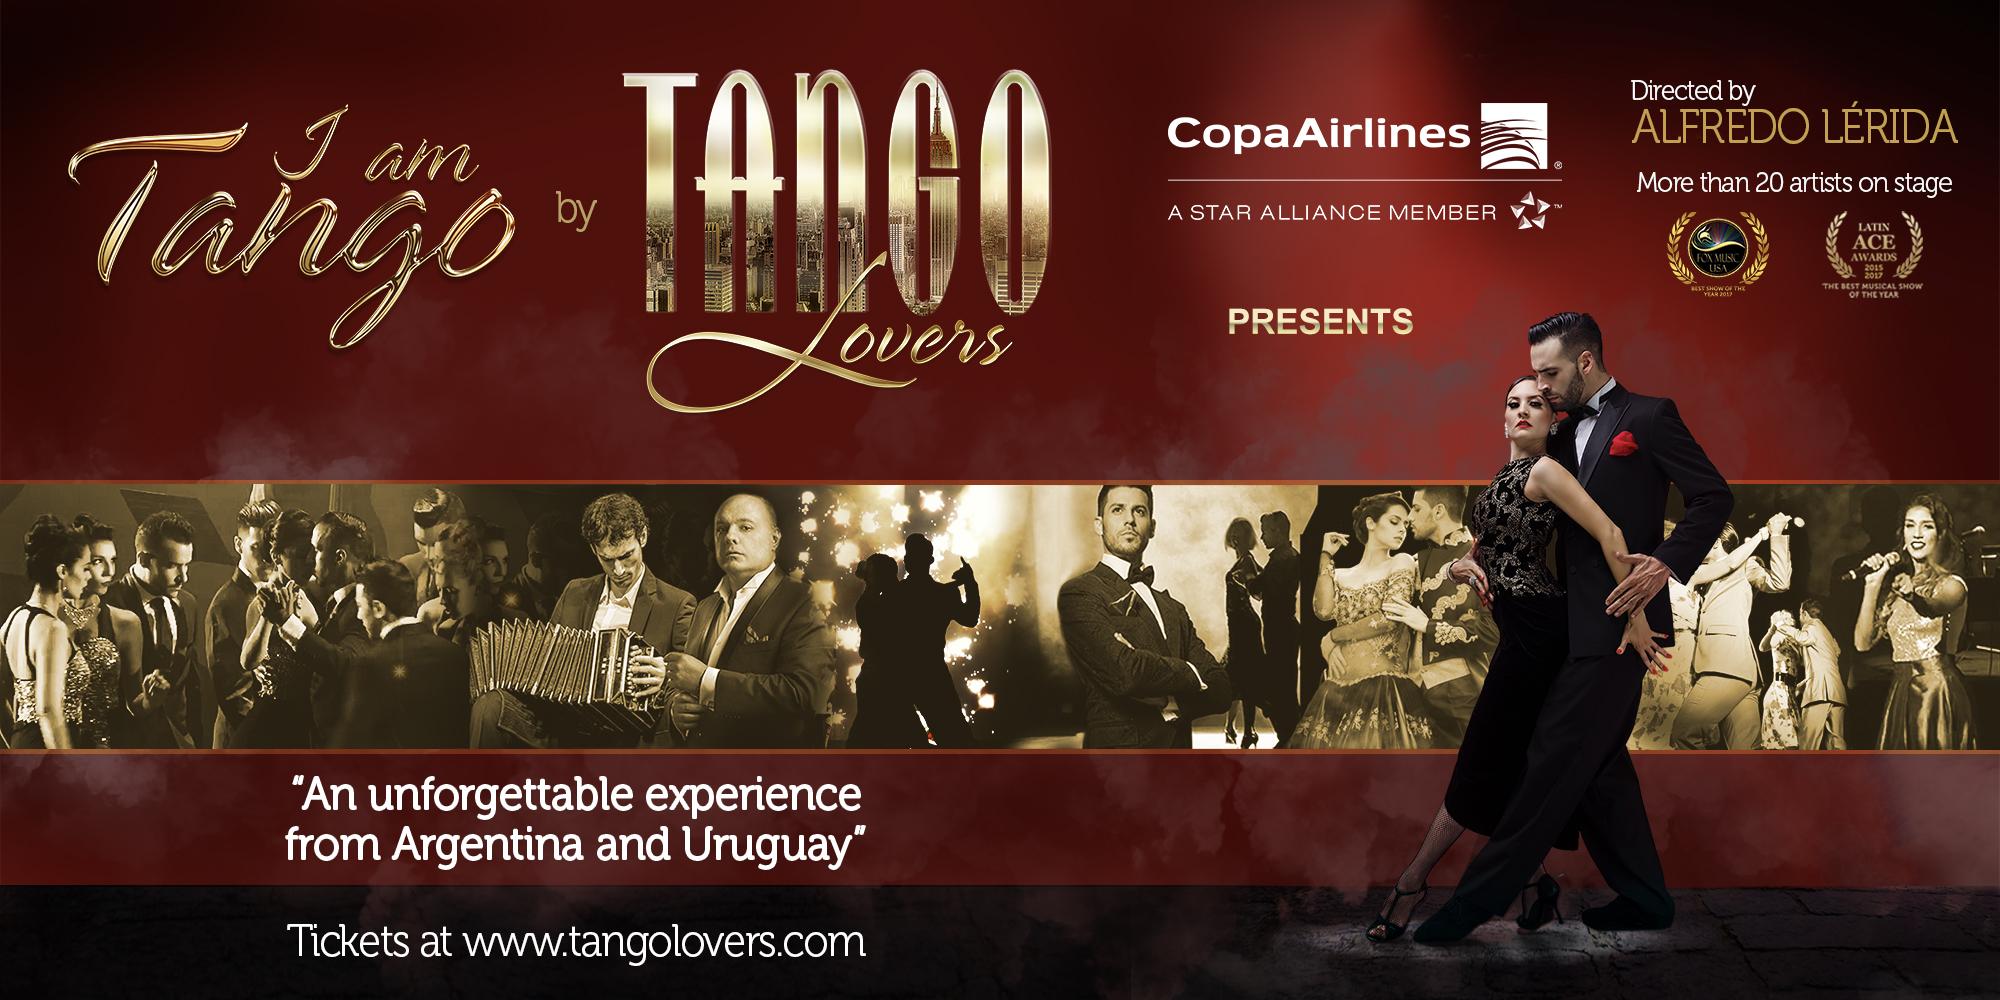 tango lovers poster